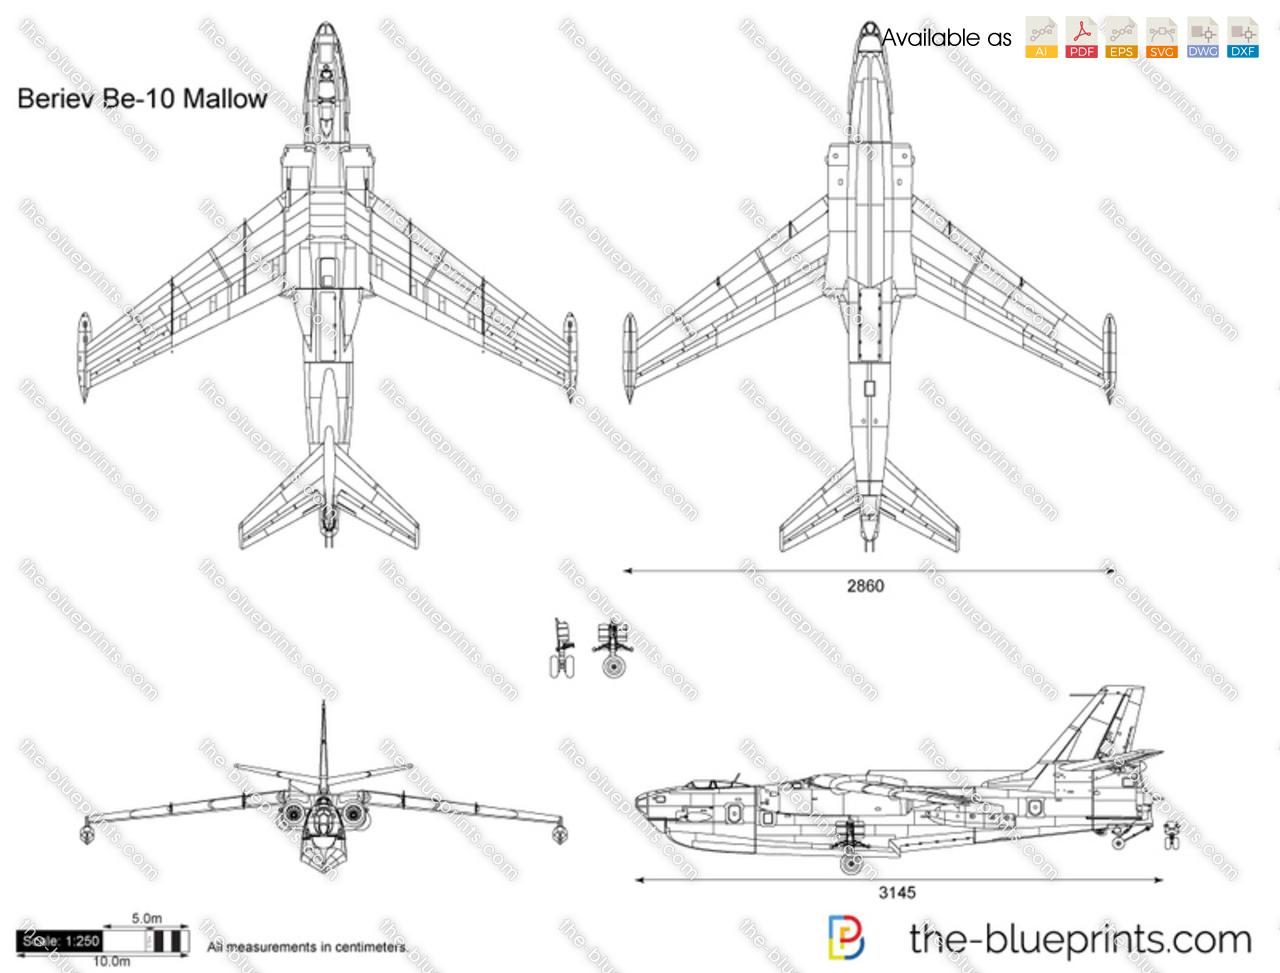 Beriev Be-10 Mallow